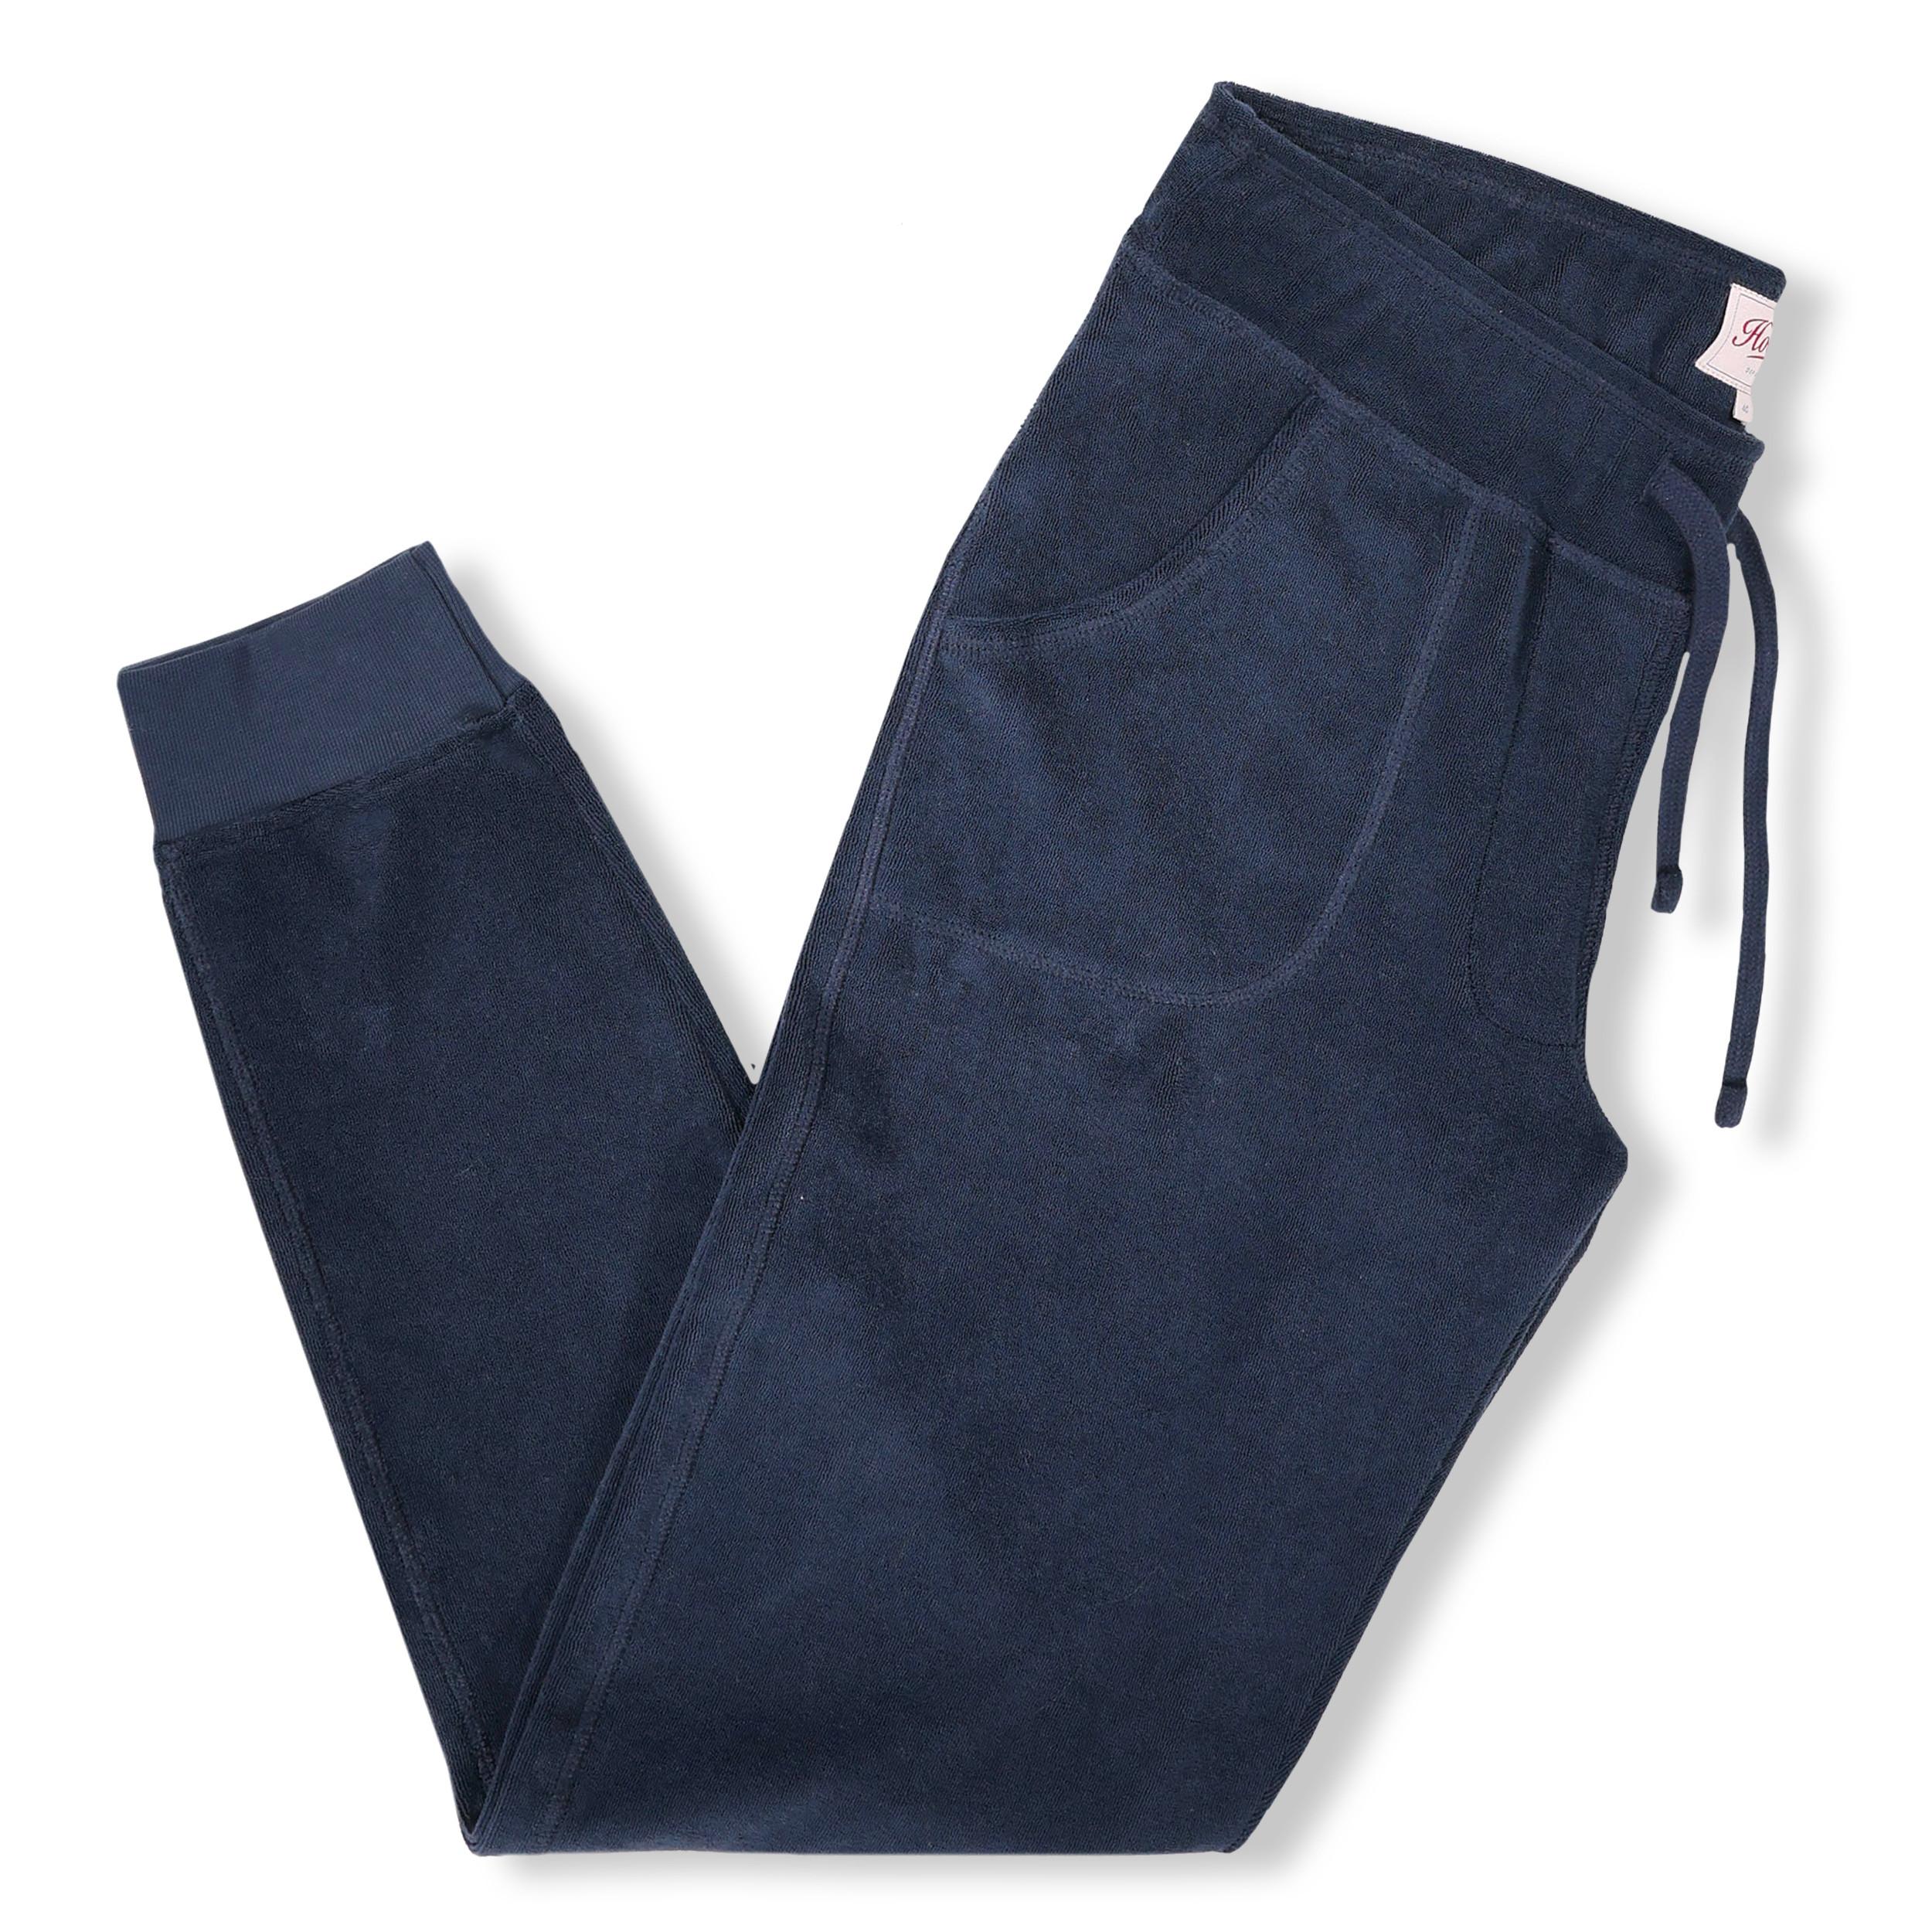 Terry pants